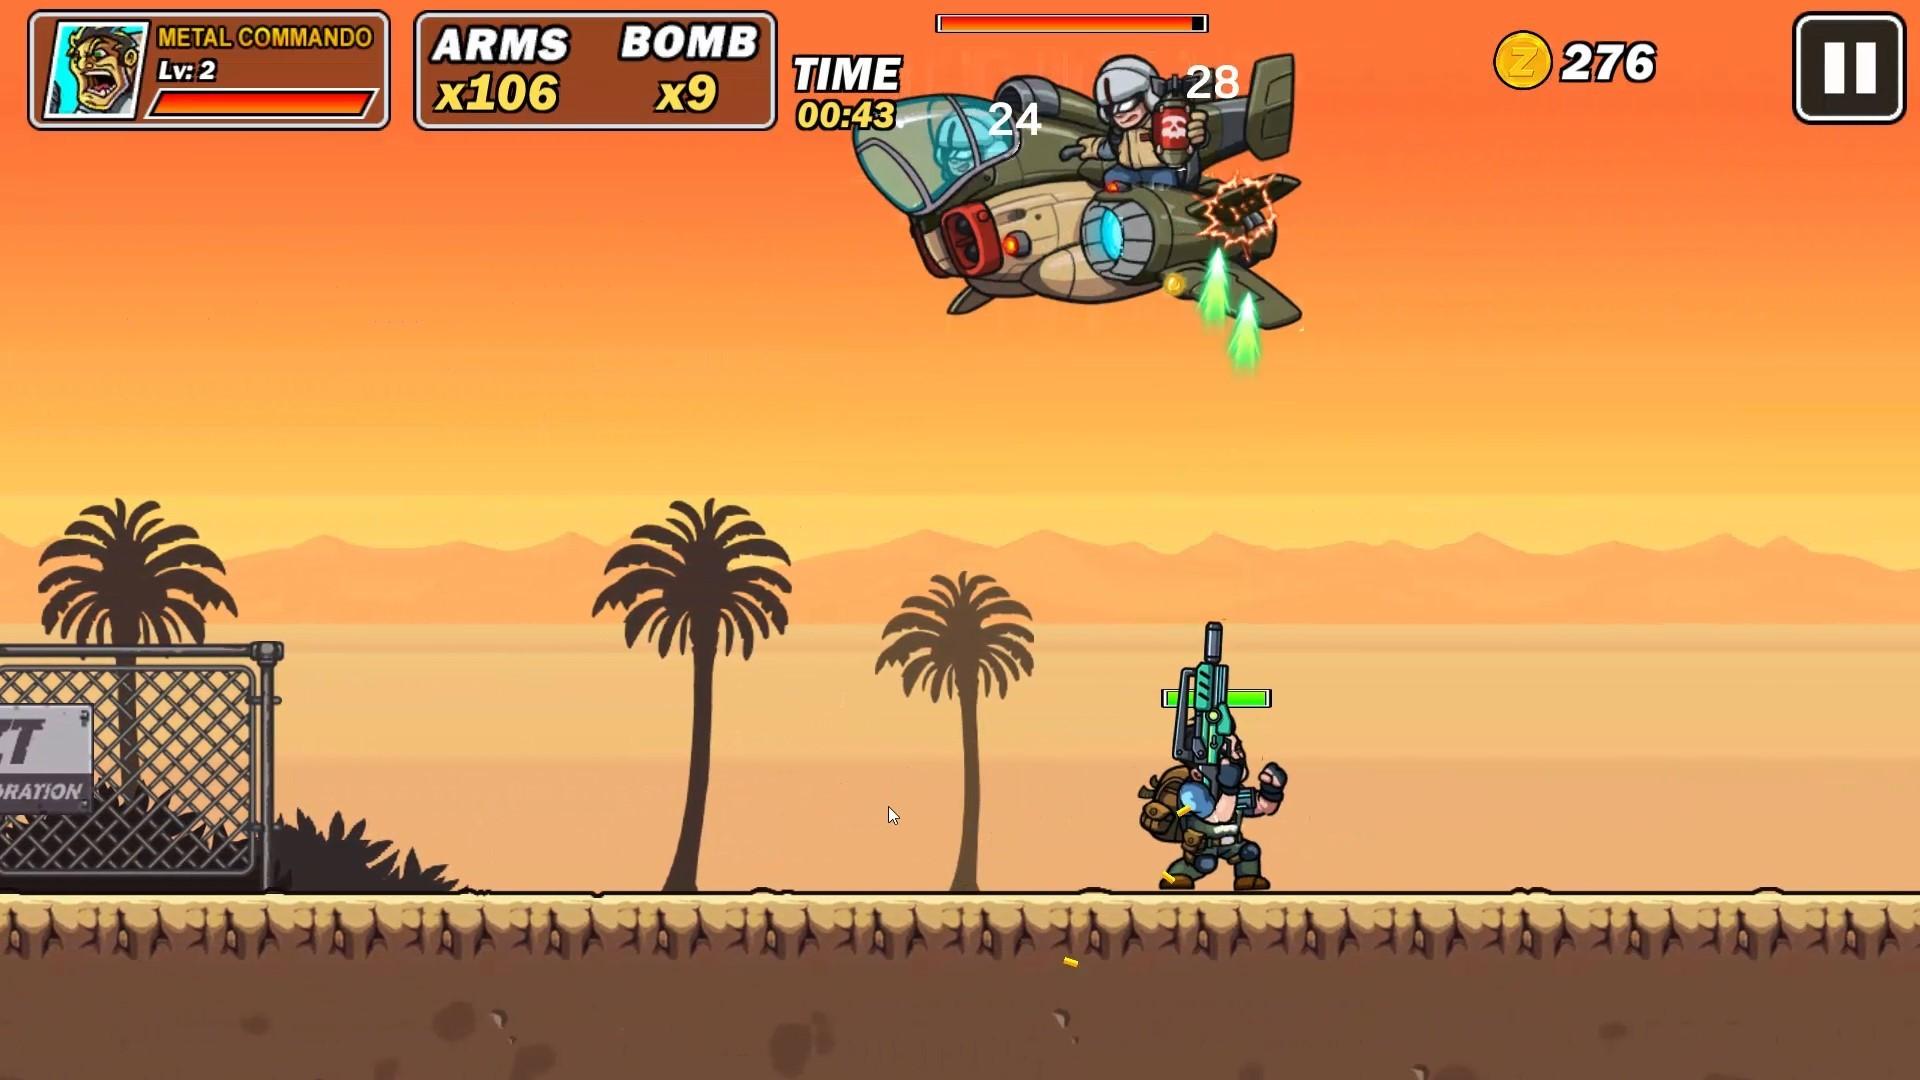 Metal Commando screenshot